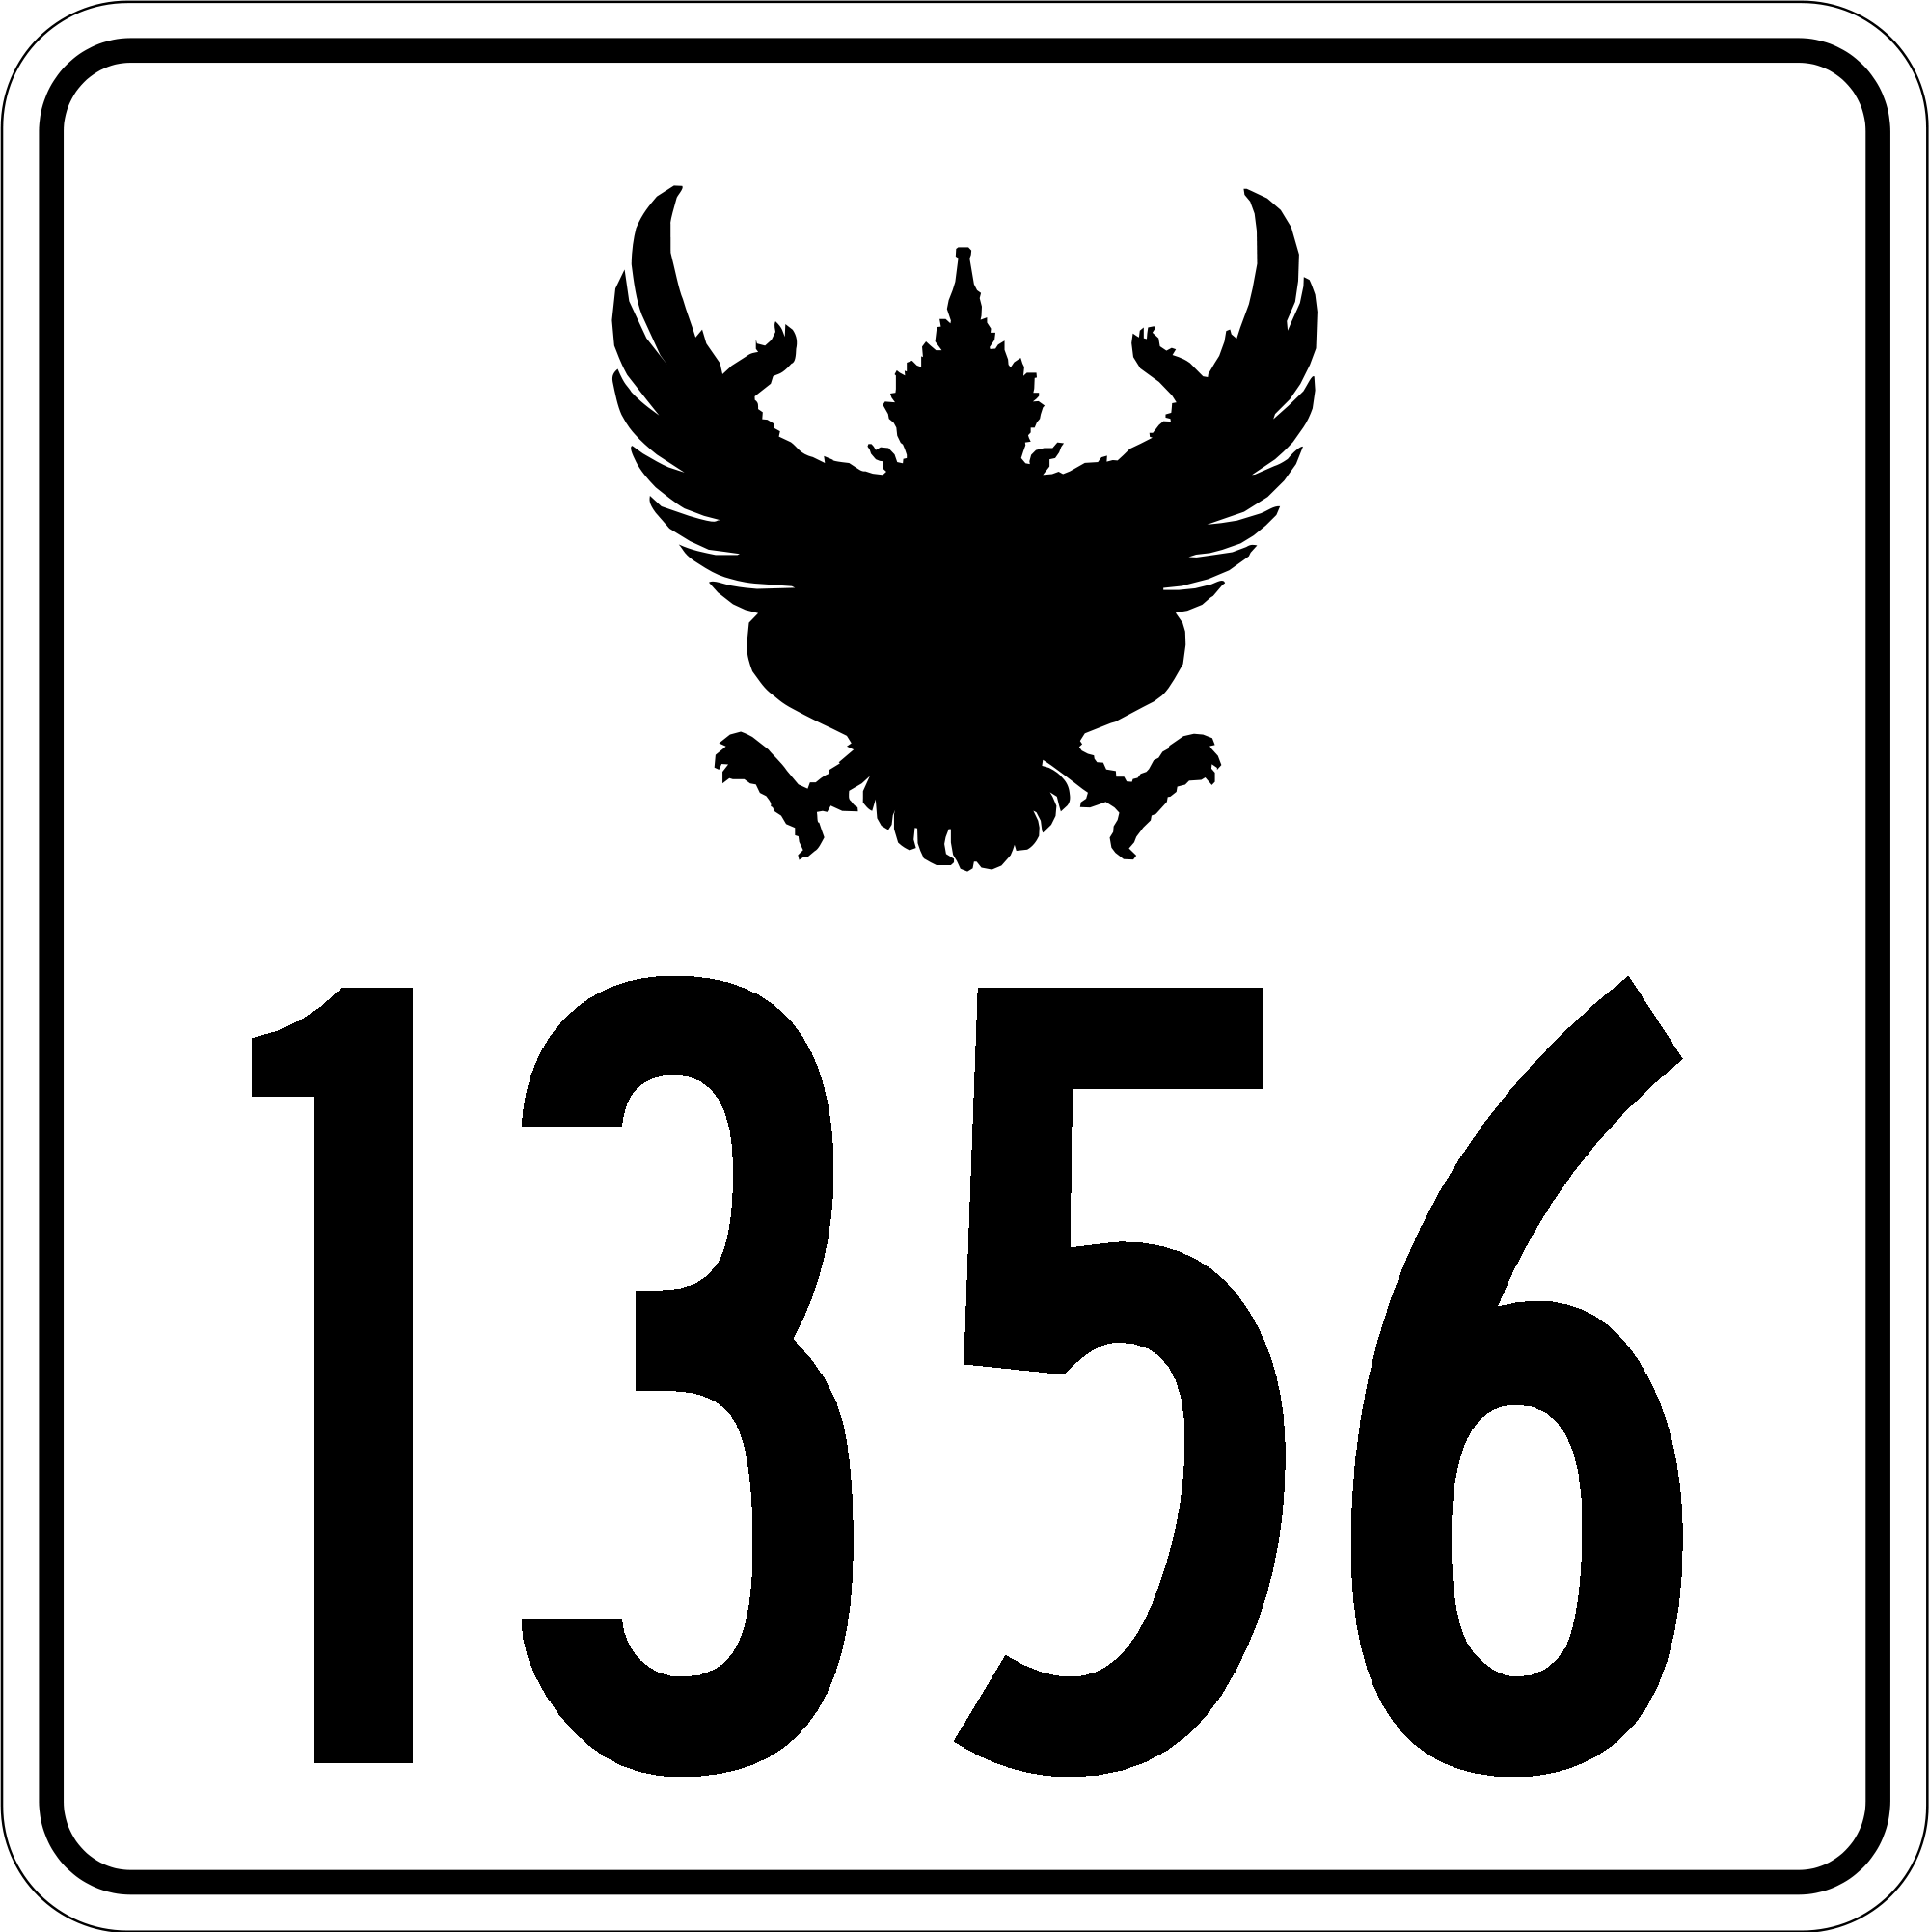 File:Thai Highway 1356.png